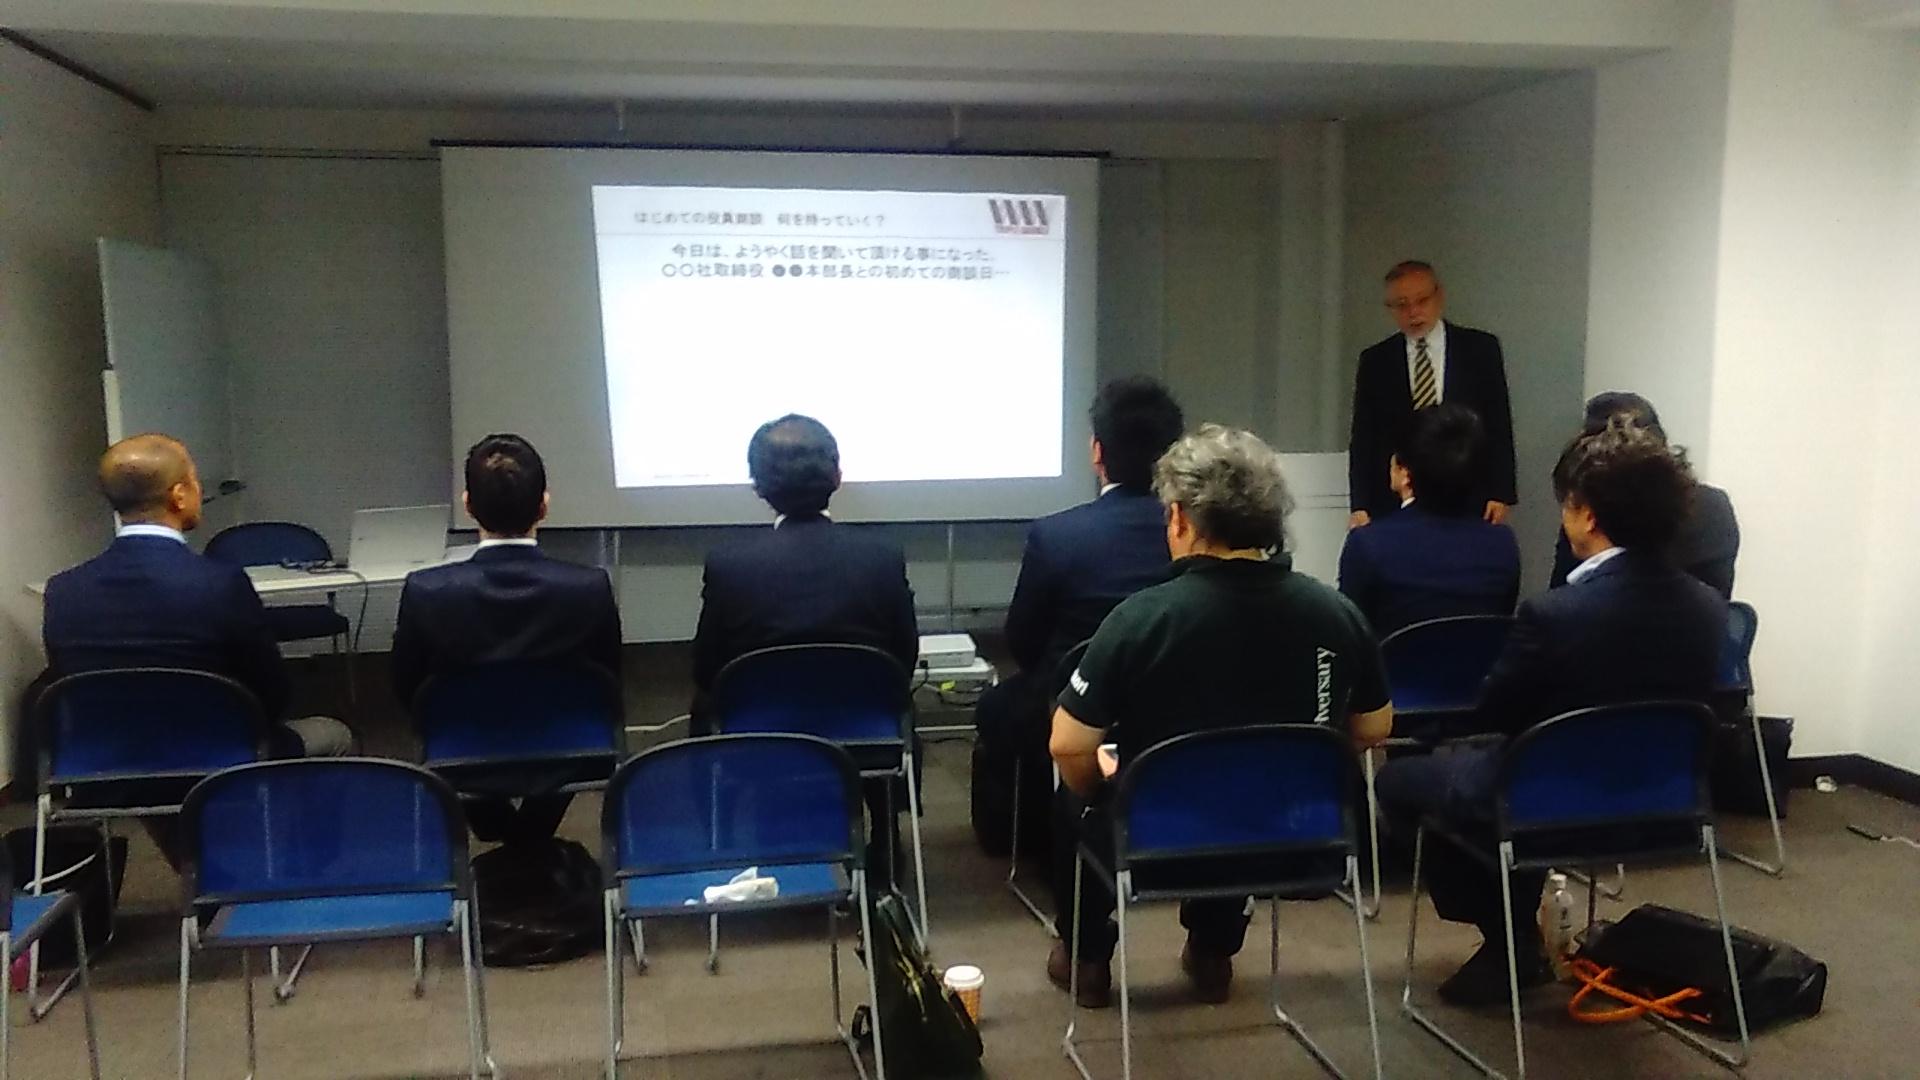 KIMG0739 - 猛獣塾入門講座開催しました。